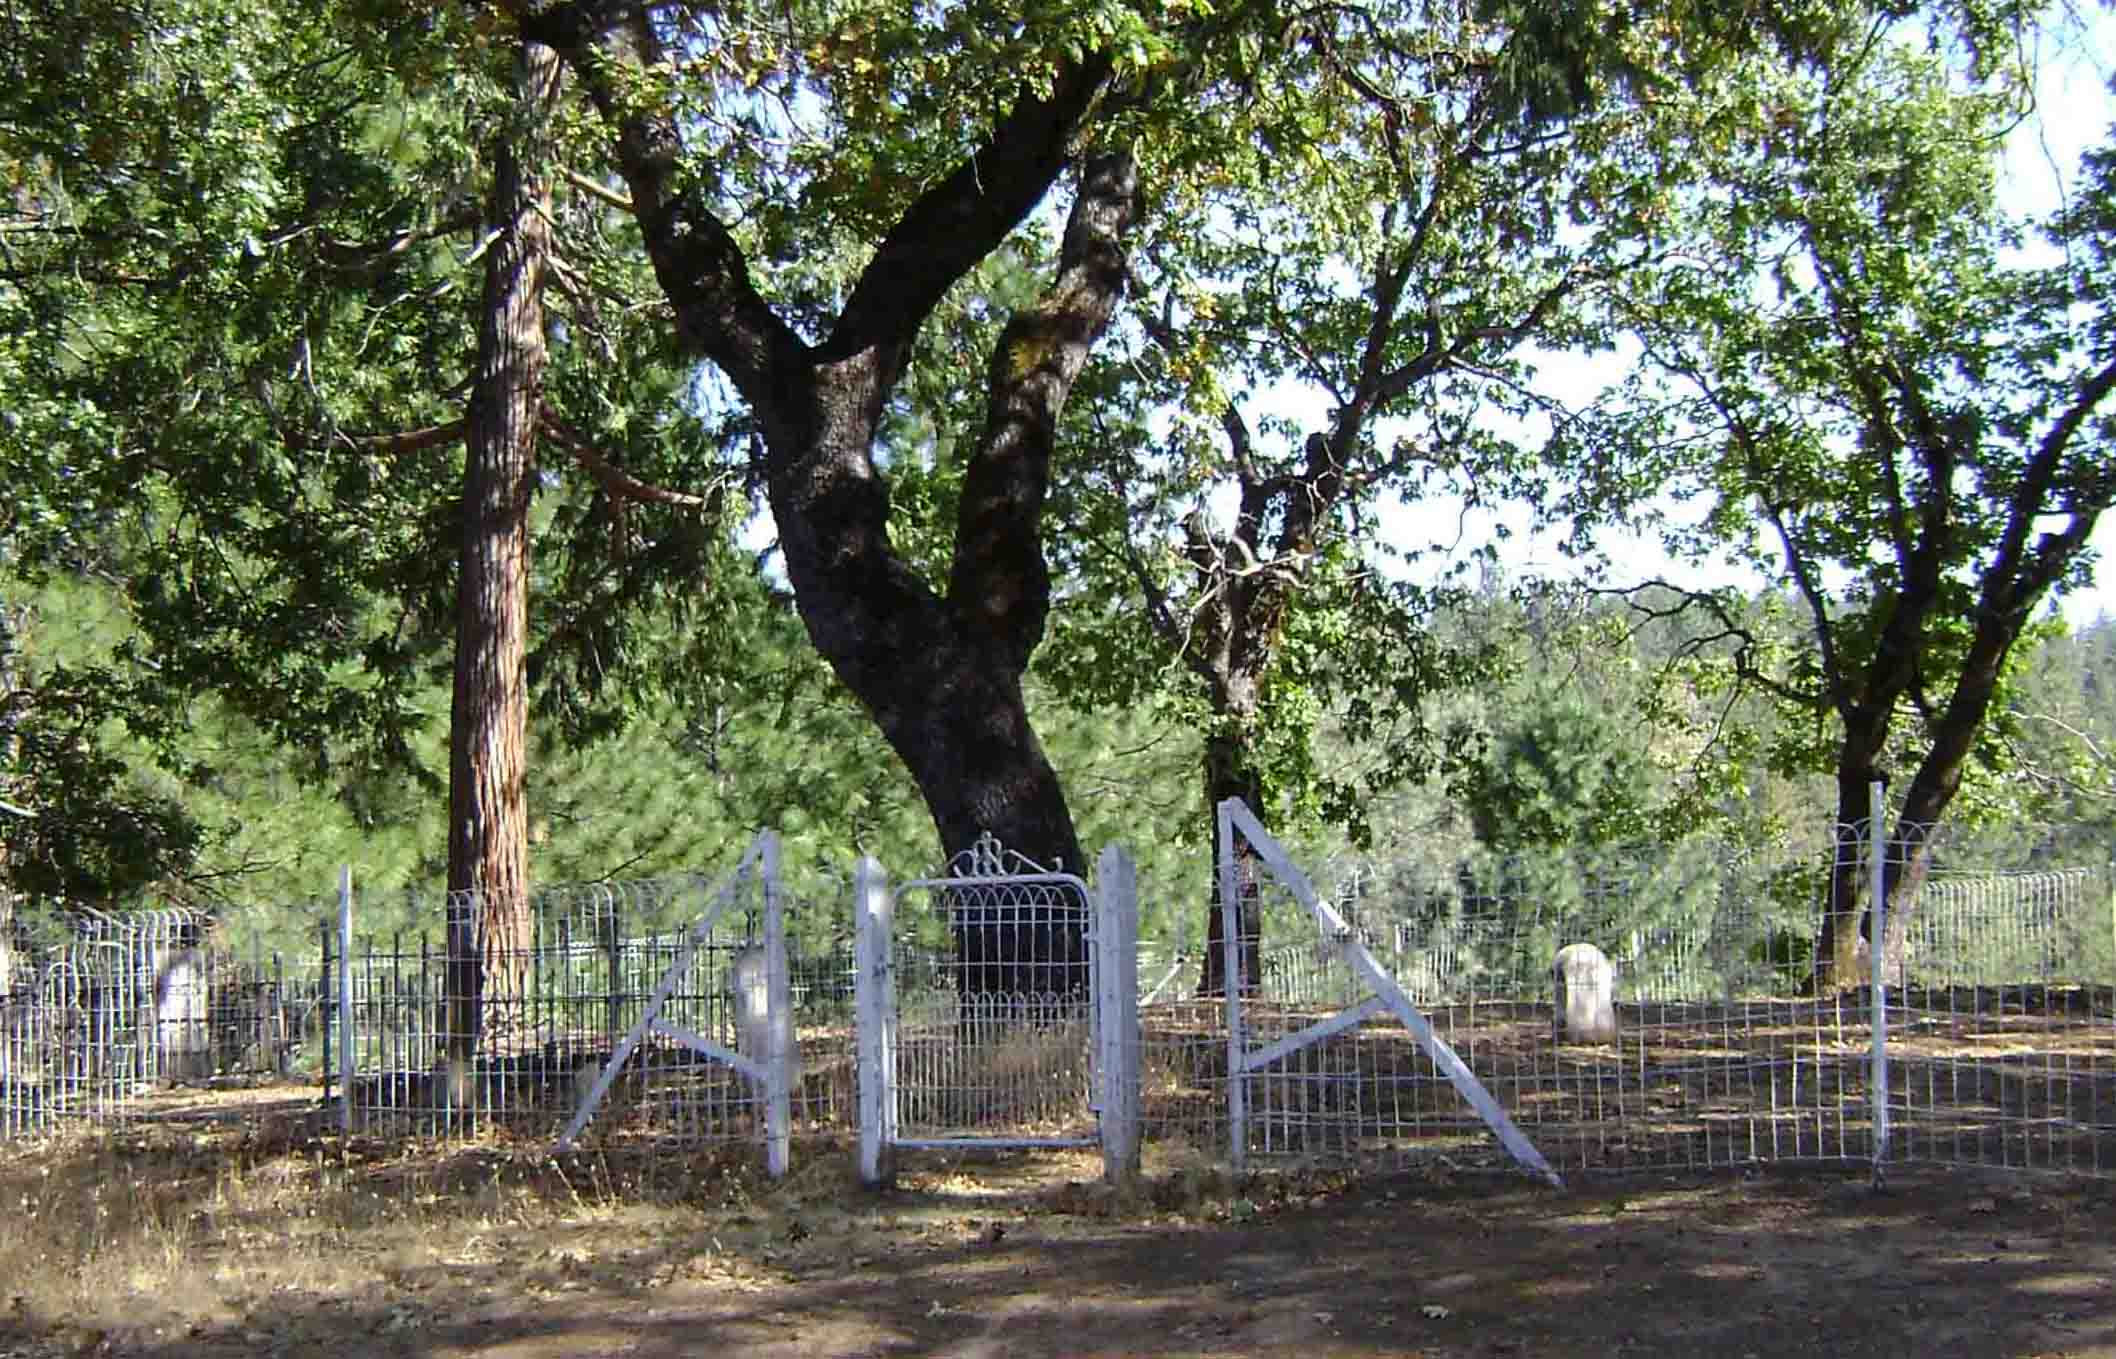 Spanish Dry Diggings Cemetery